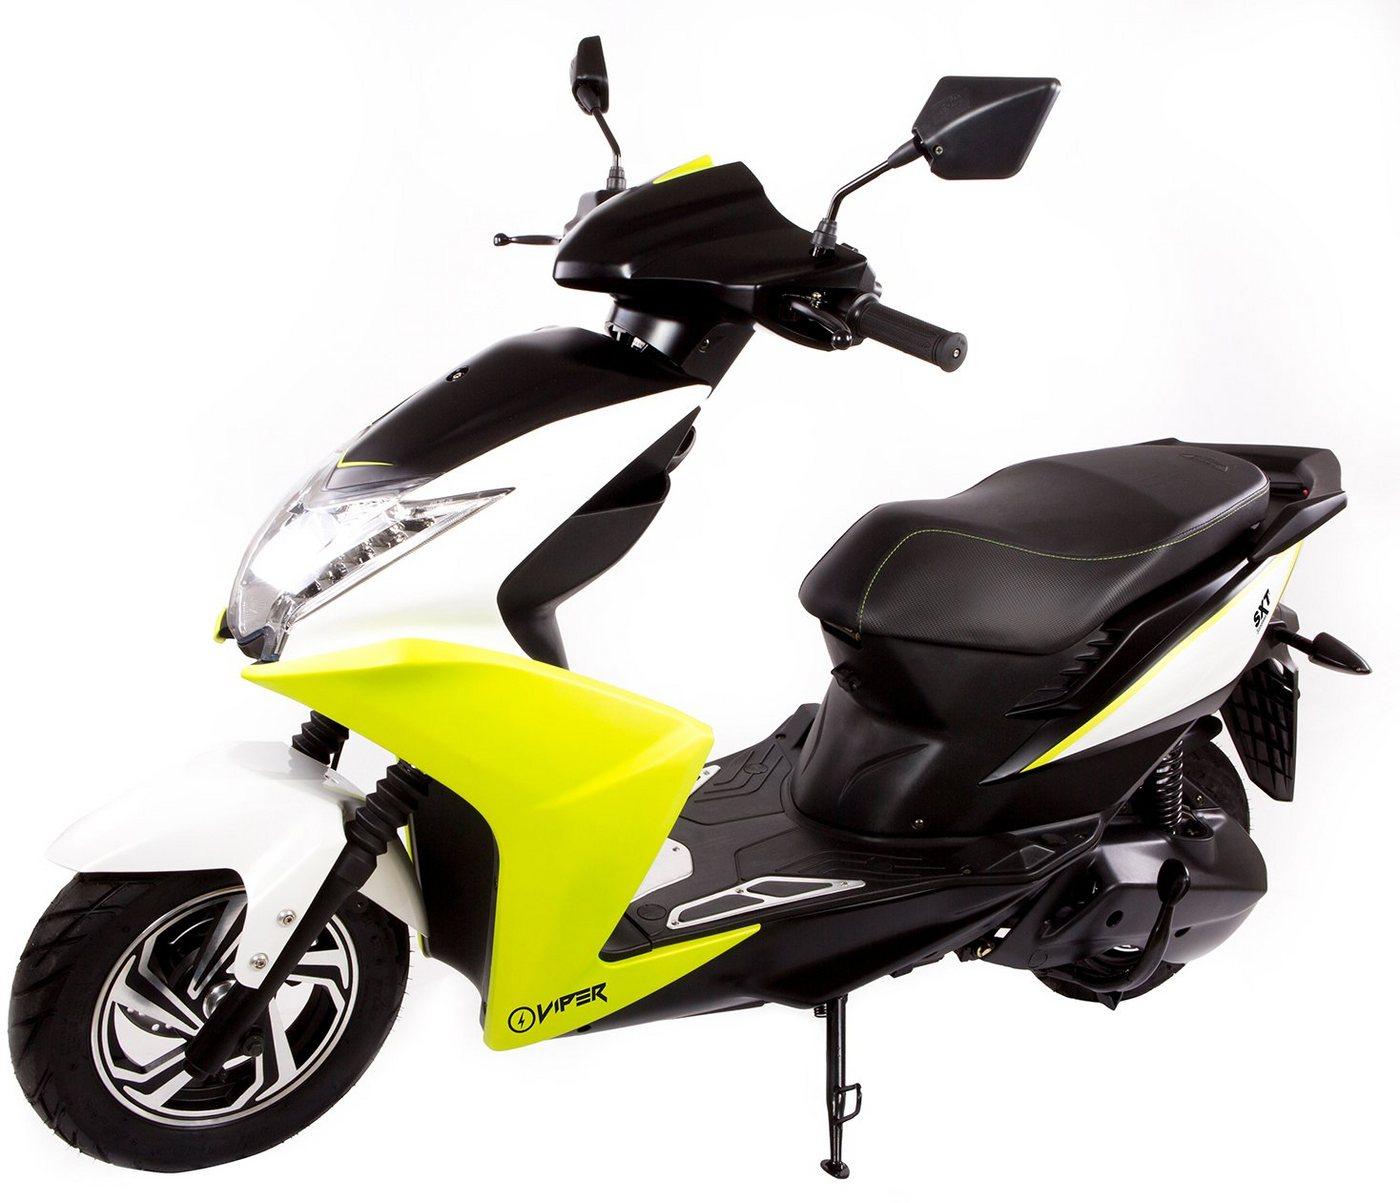 Sxt Scooters Elektroroller, 2000 Watt, 45 km/h, »SXT Viper«